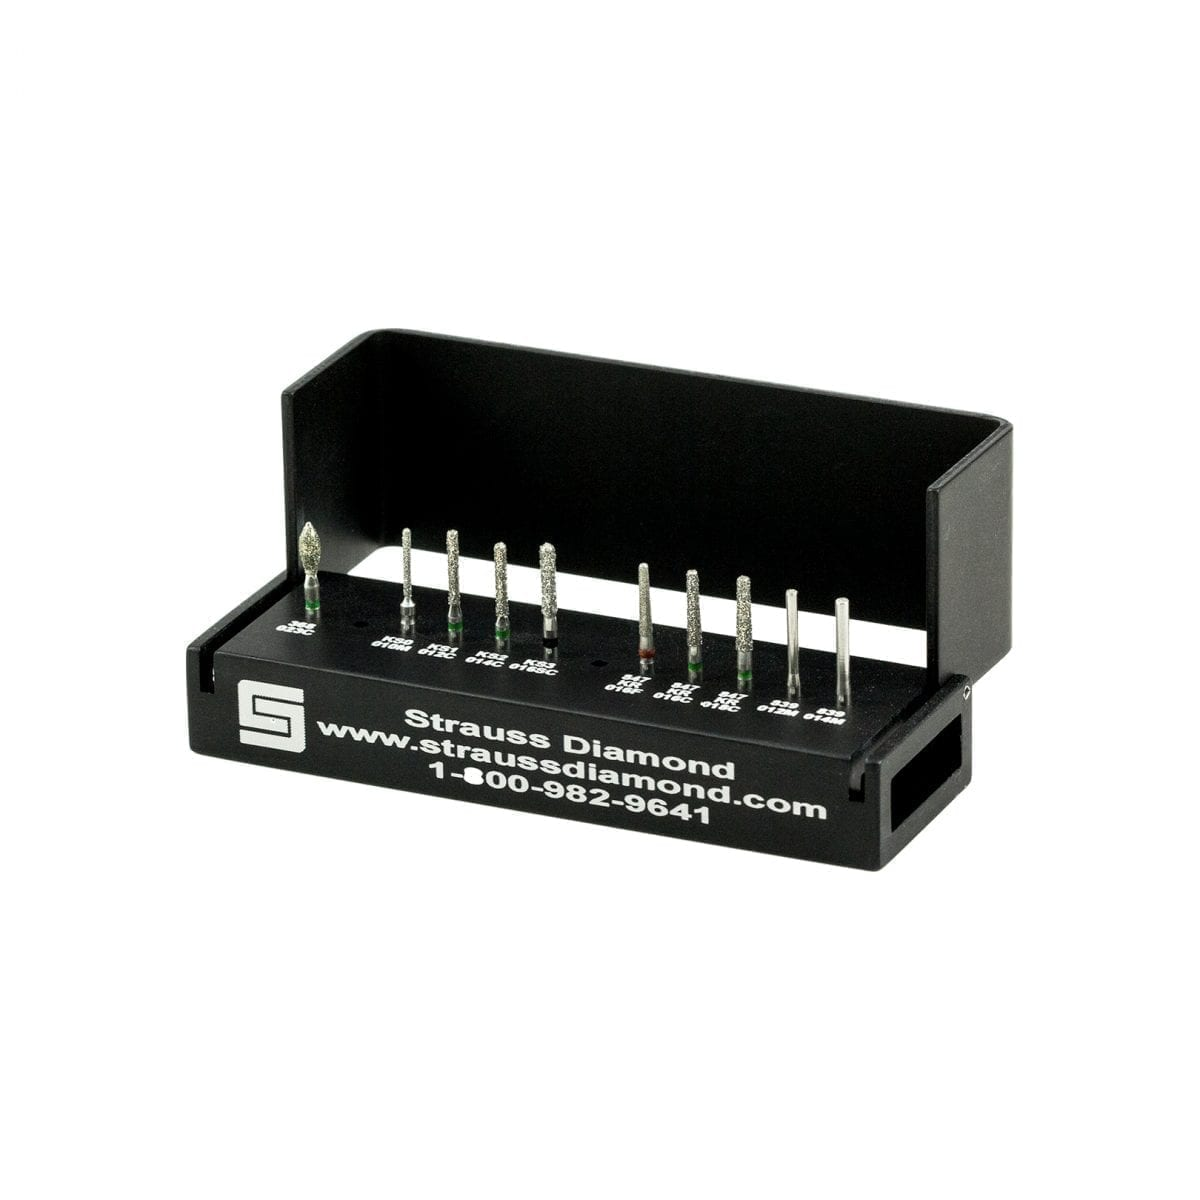 Lava All Ceram Preparation System - Strauss Diamond Instruments, Inc.